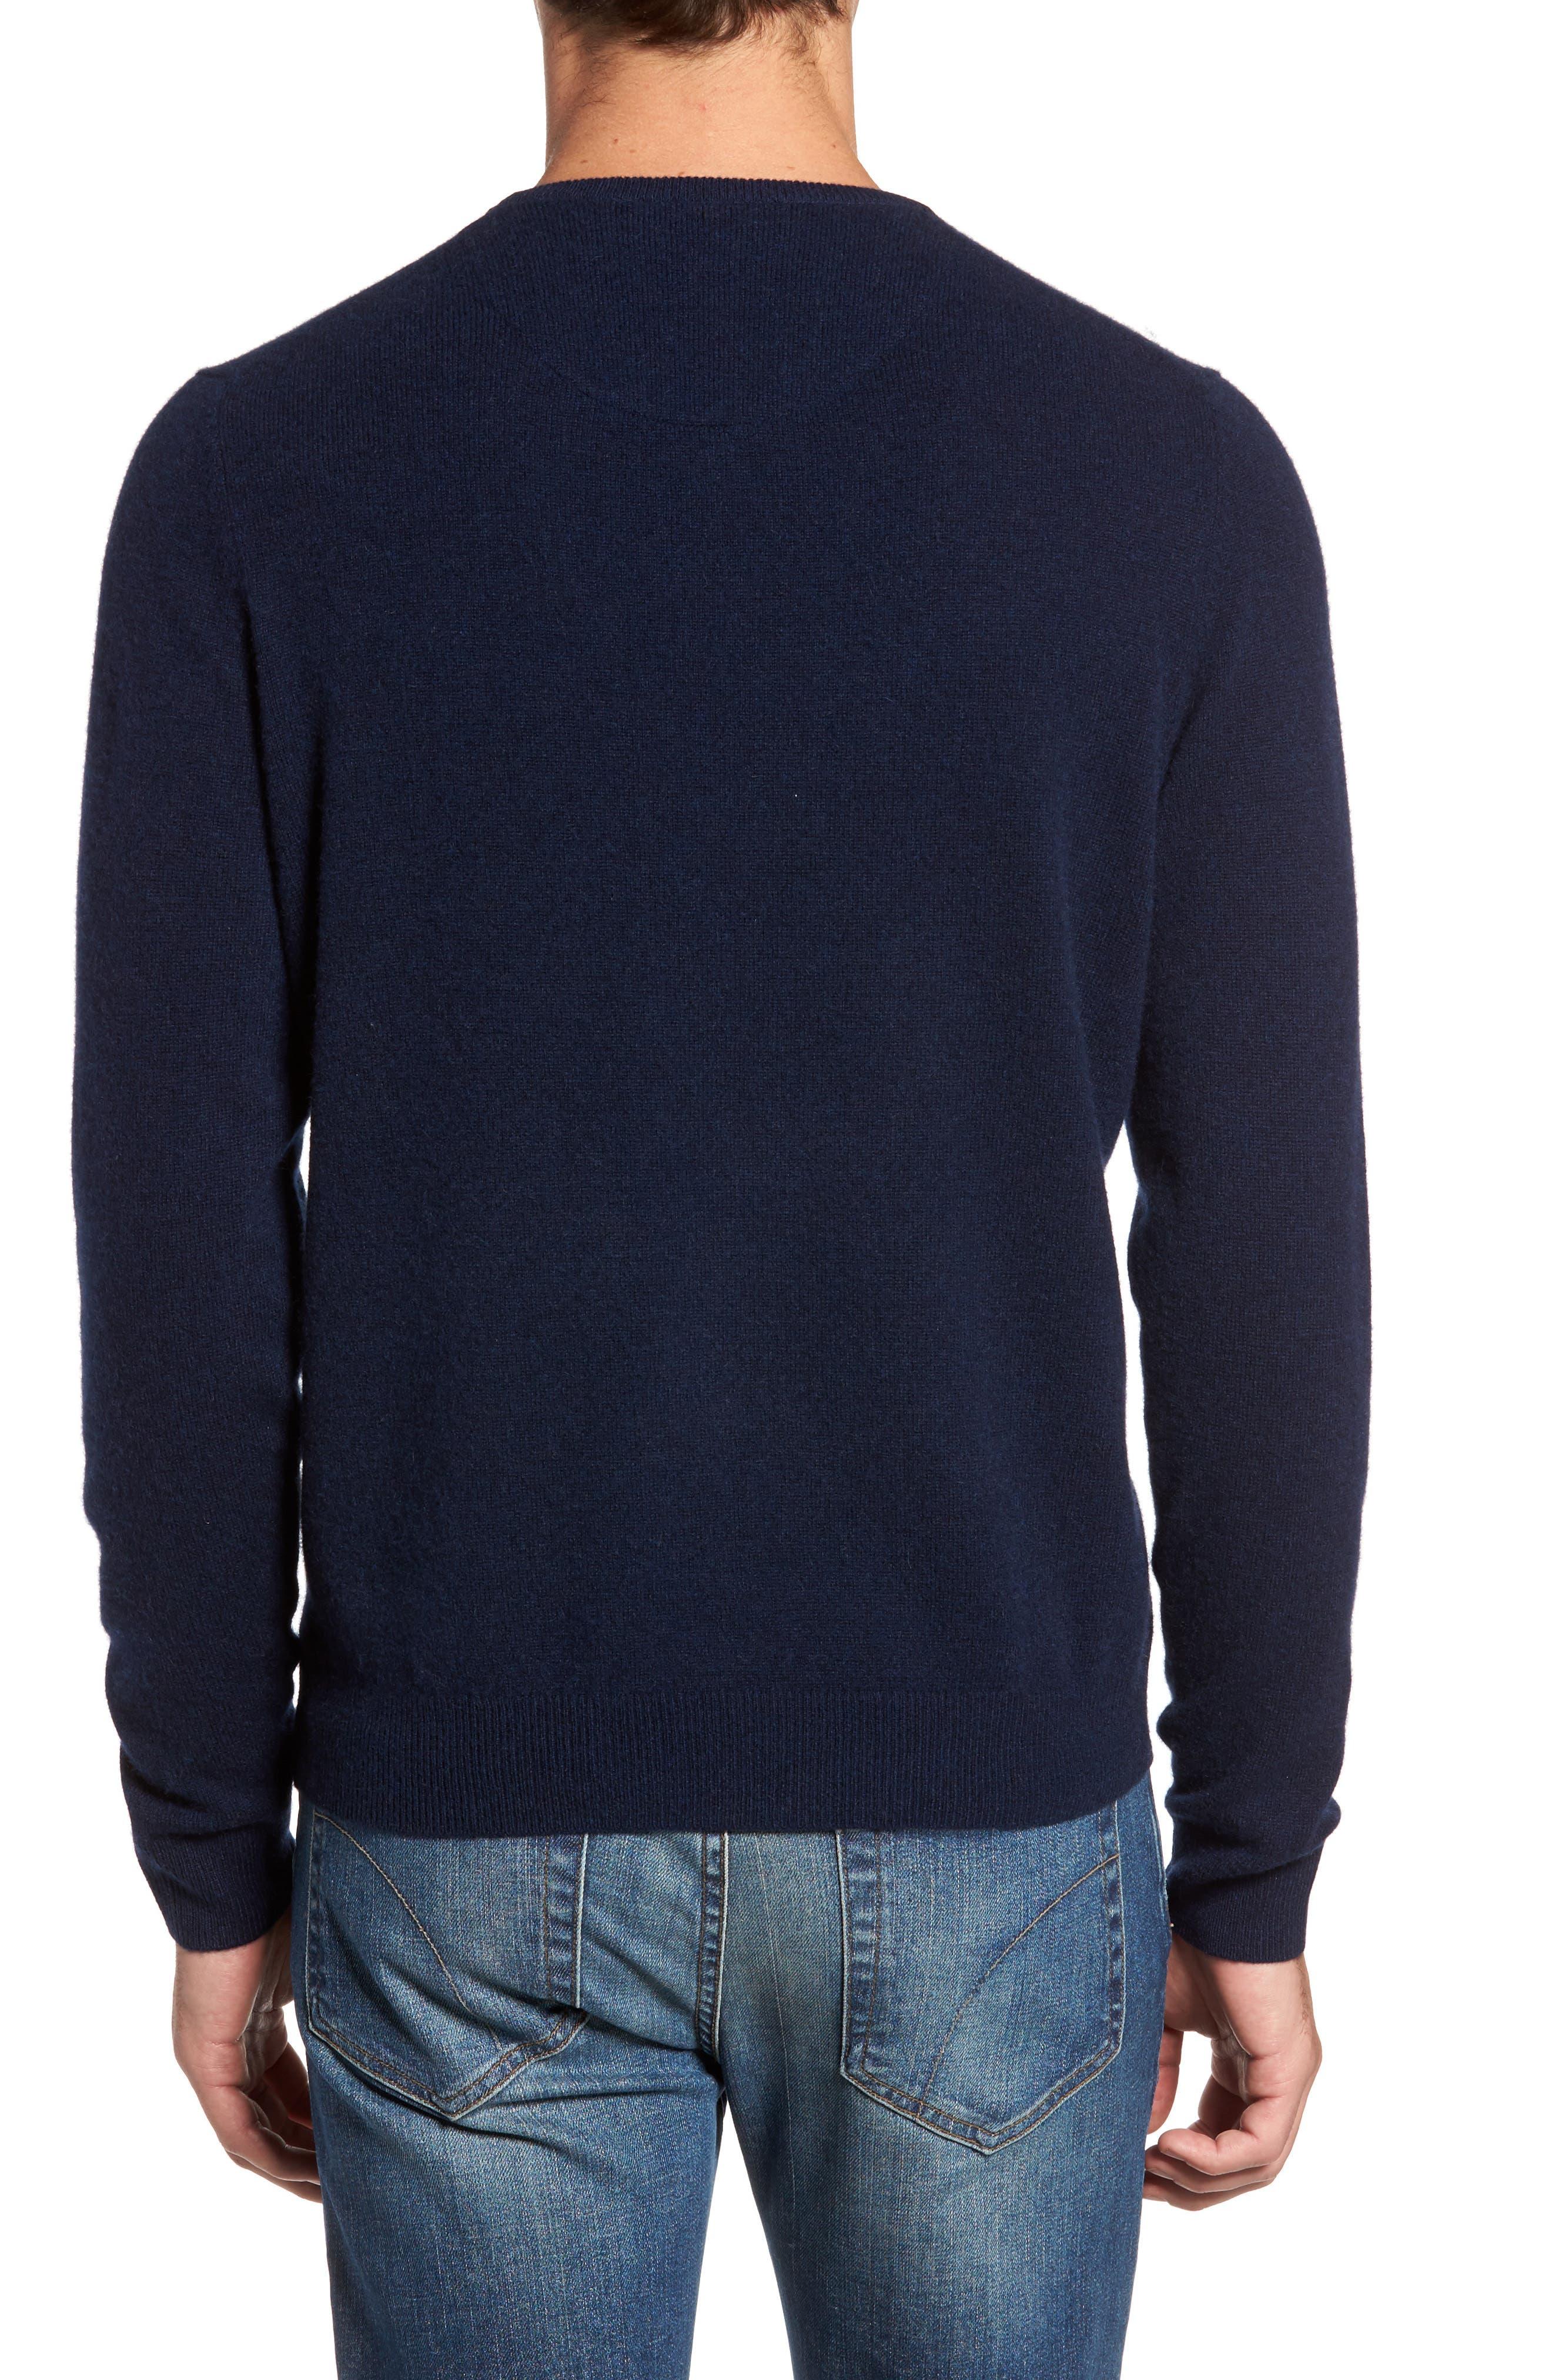 Cashmere Crewneck Sweater,                             Alternate thumbnail 2, color,                             Navy Charcoal